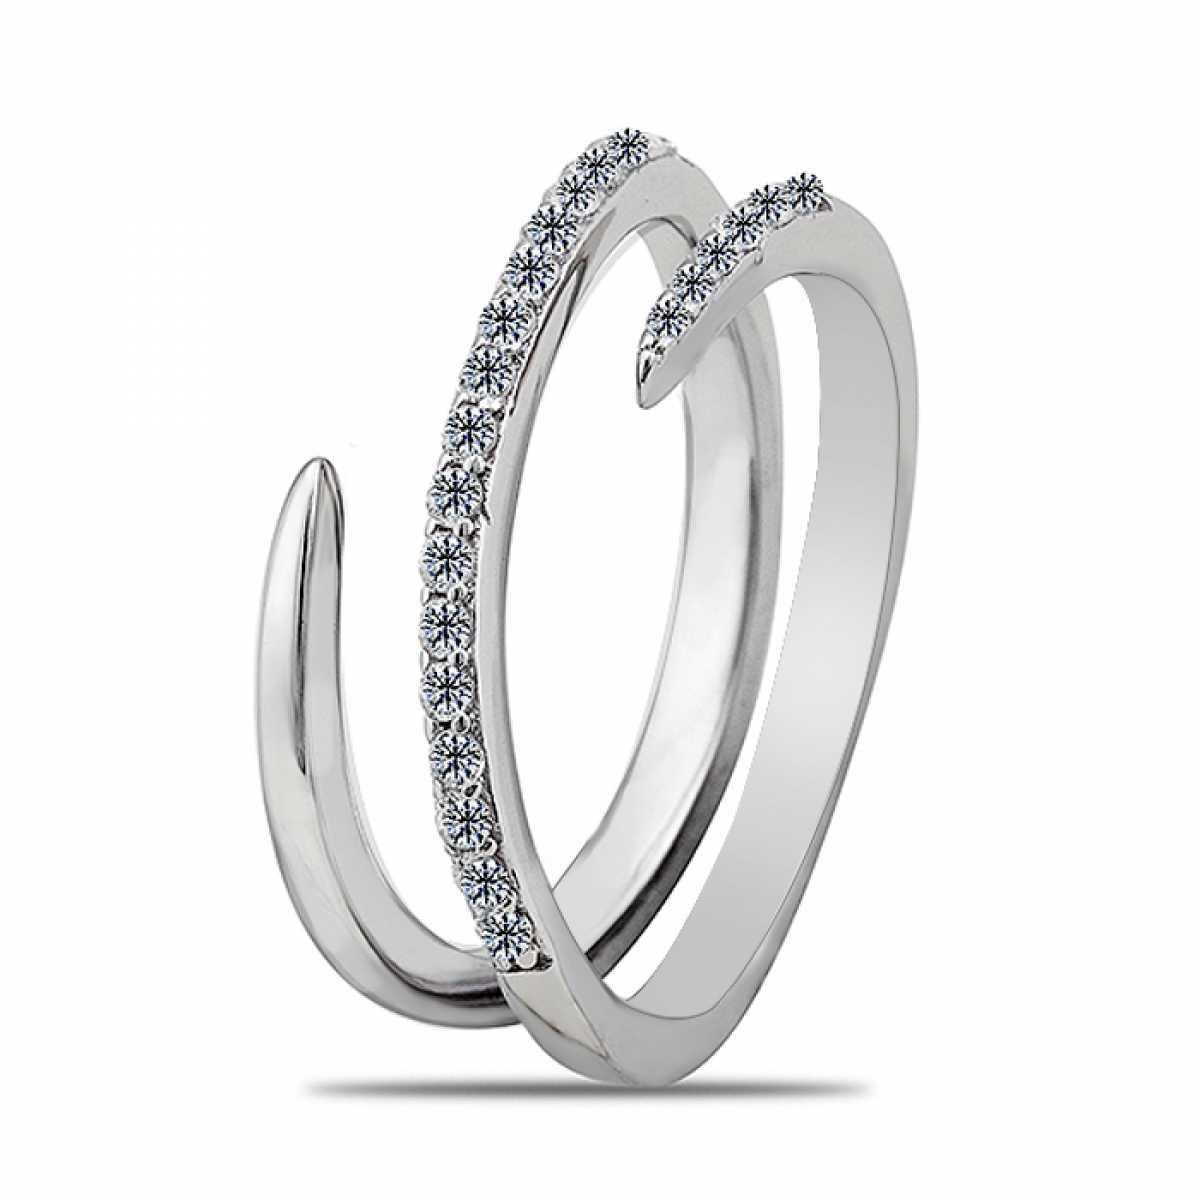 Strip Design Cocktail Ring